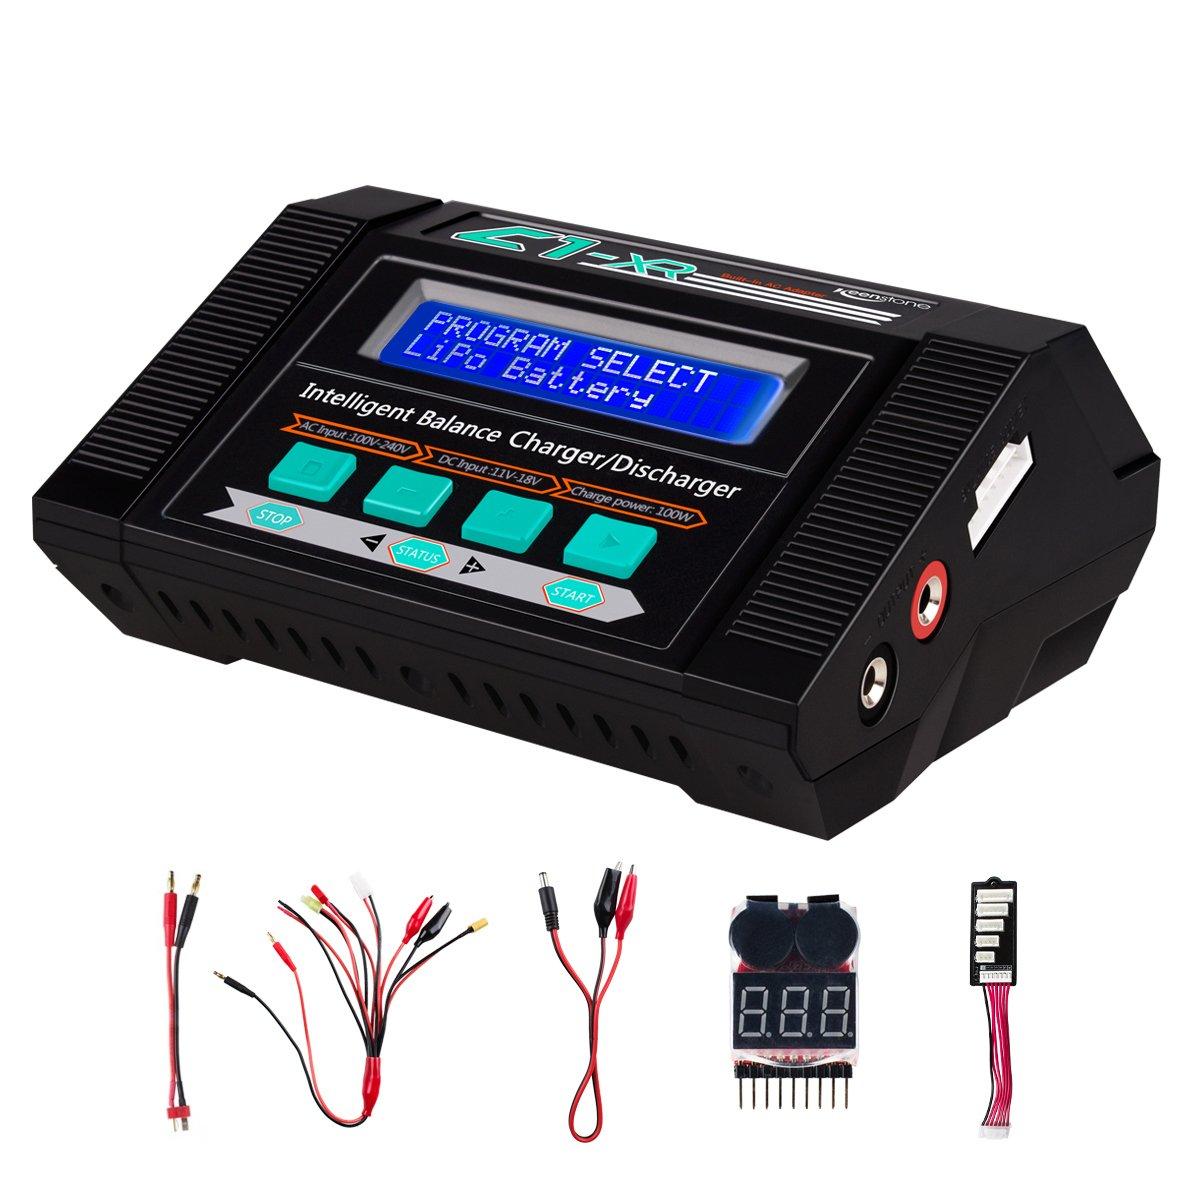 Keenstone Battery Charger Discharger Voltage